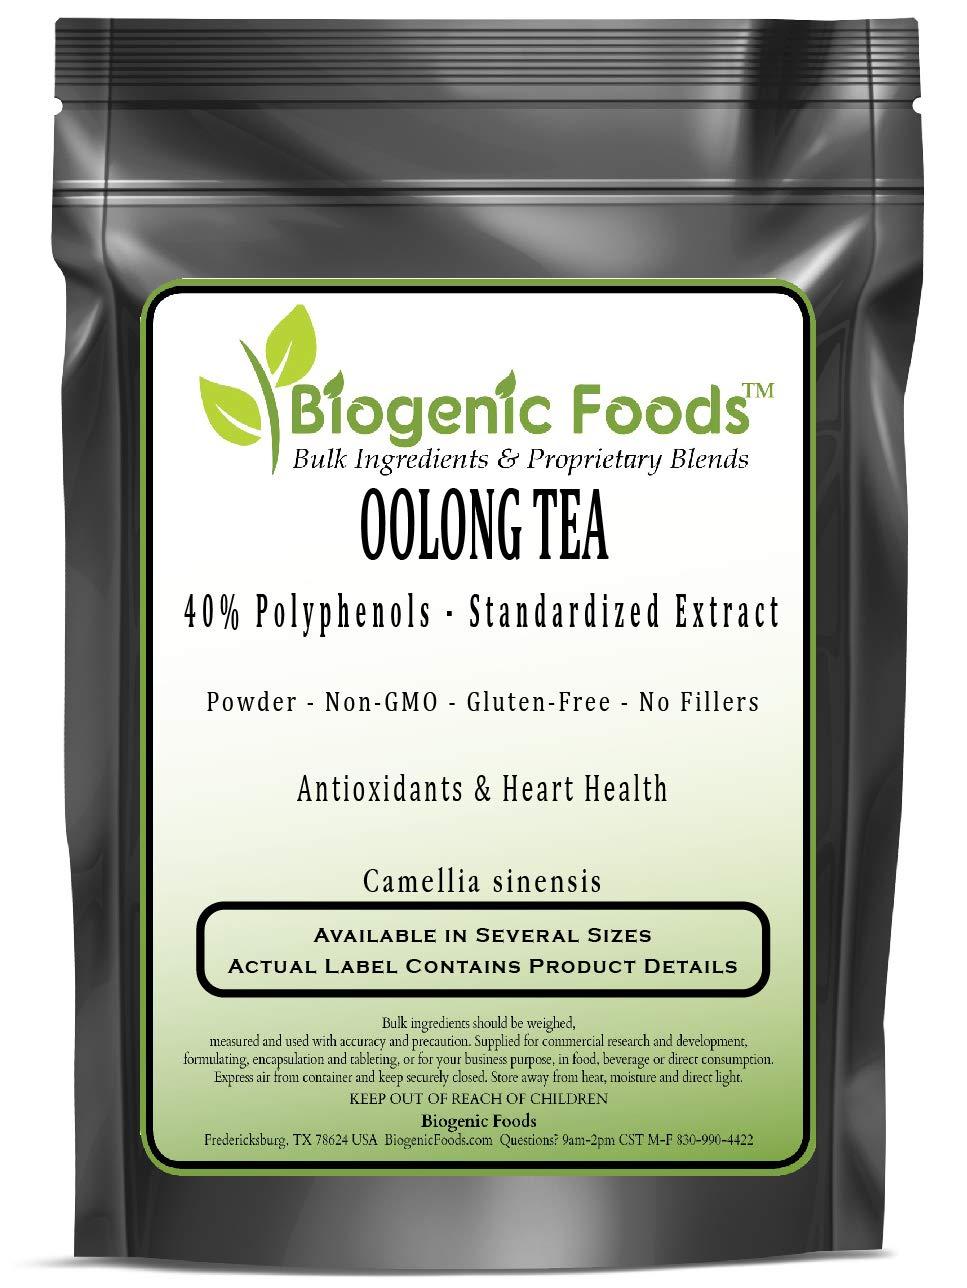 Oolong Tea - 40% Polyphenols - Standardized Powder Extract (Camellia sinensis), 5 kg